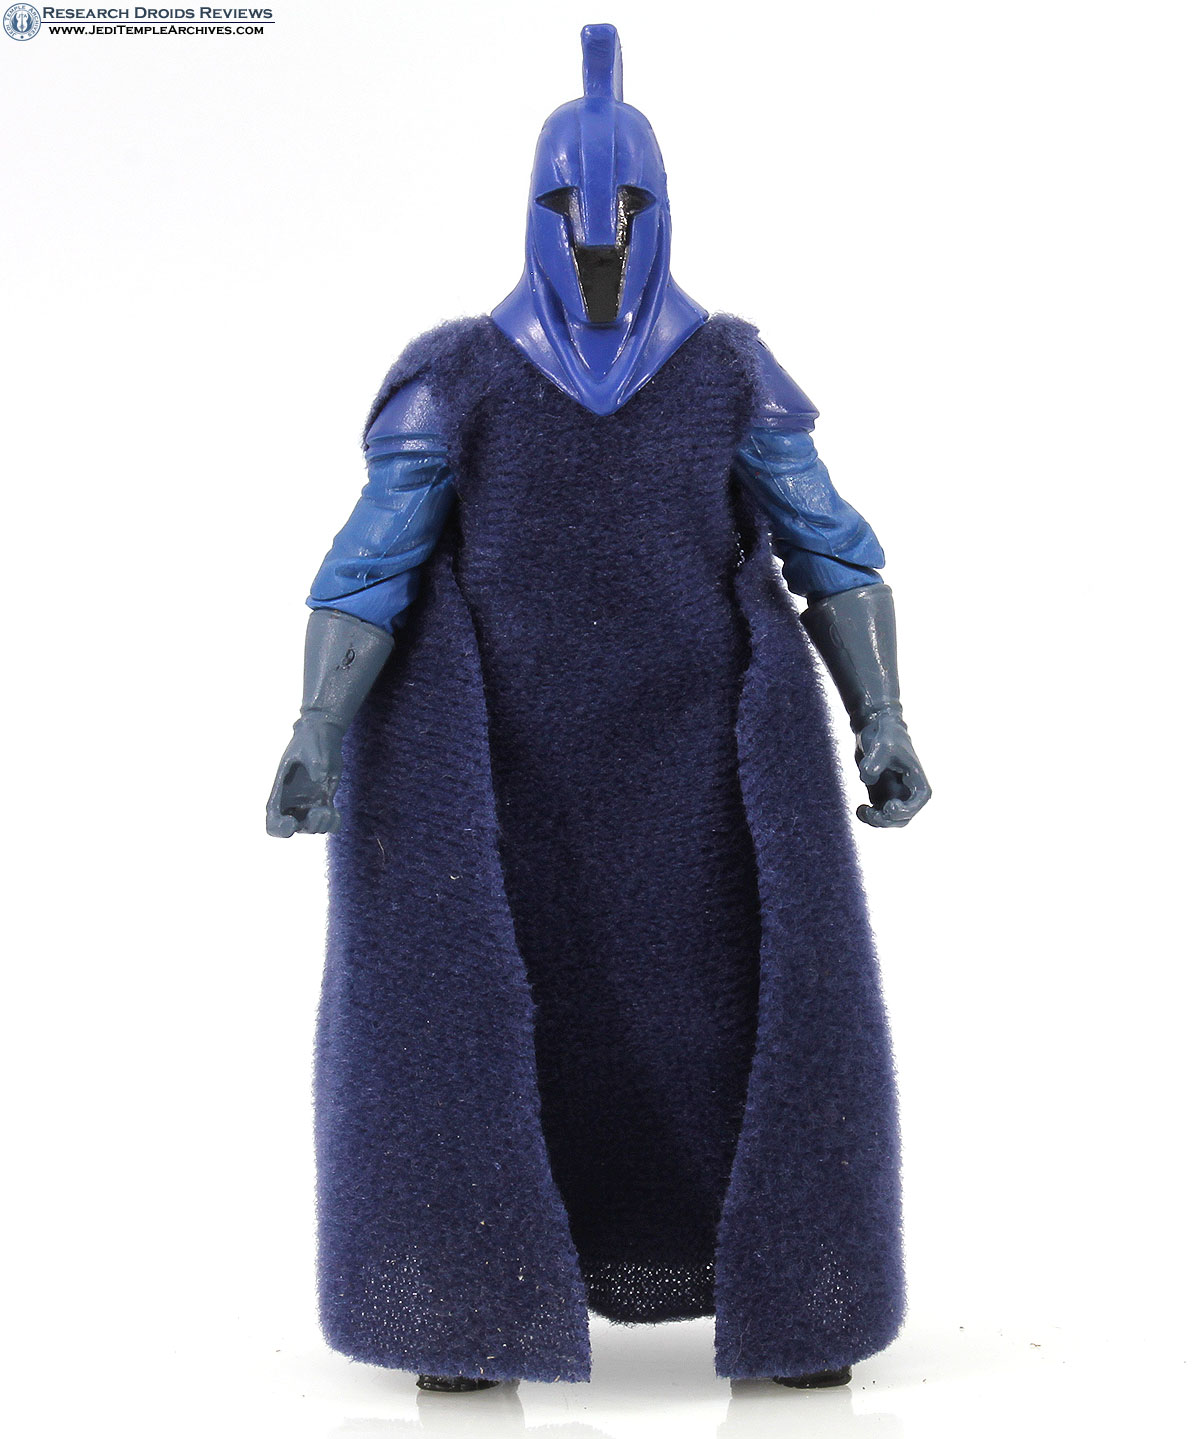 Royal Guard (Senate Security - blue)